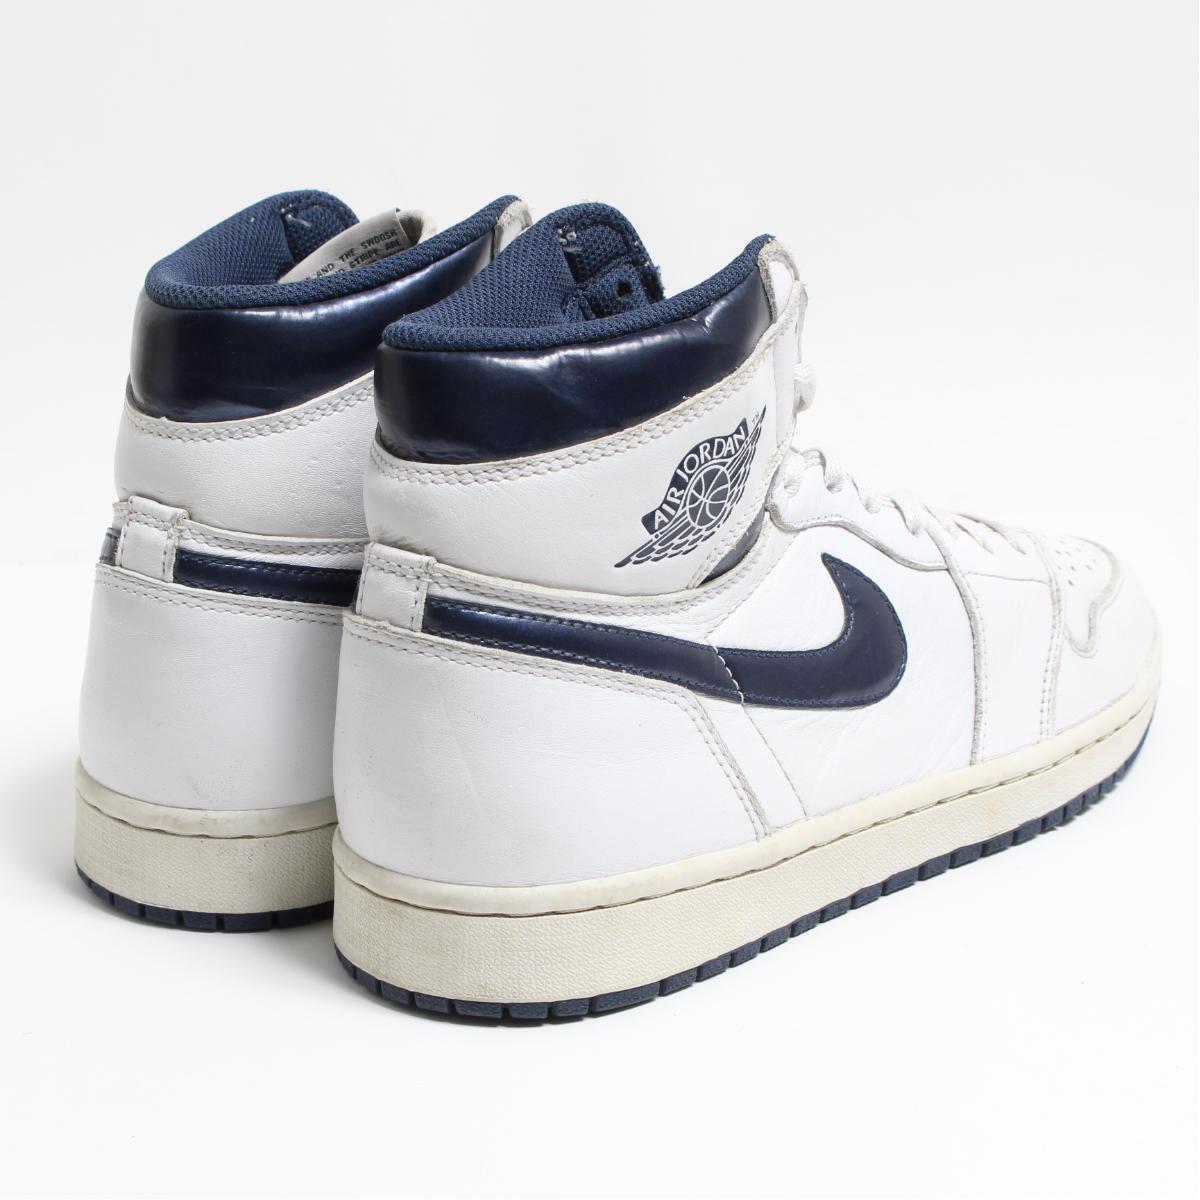 feae5e378398 VINTAGE CLOTHING JAM  Nike NIKE AIR JORDAN 1 RETRO sneakers US10 men ...